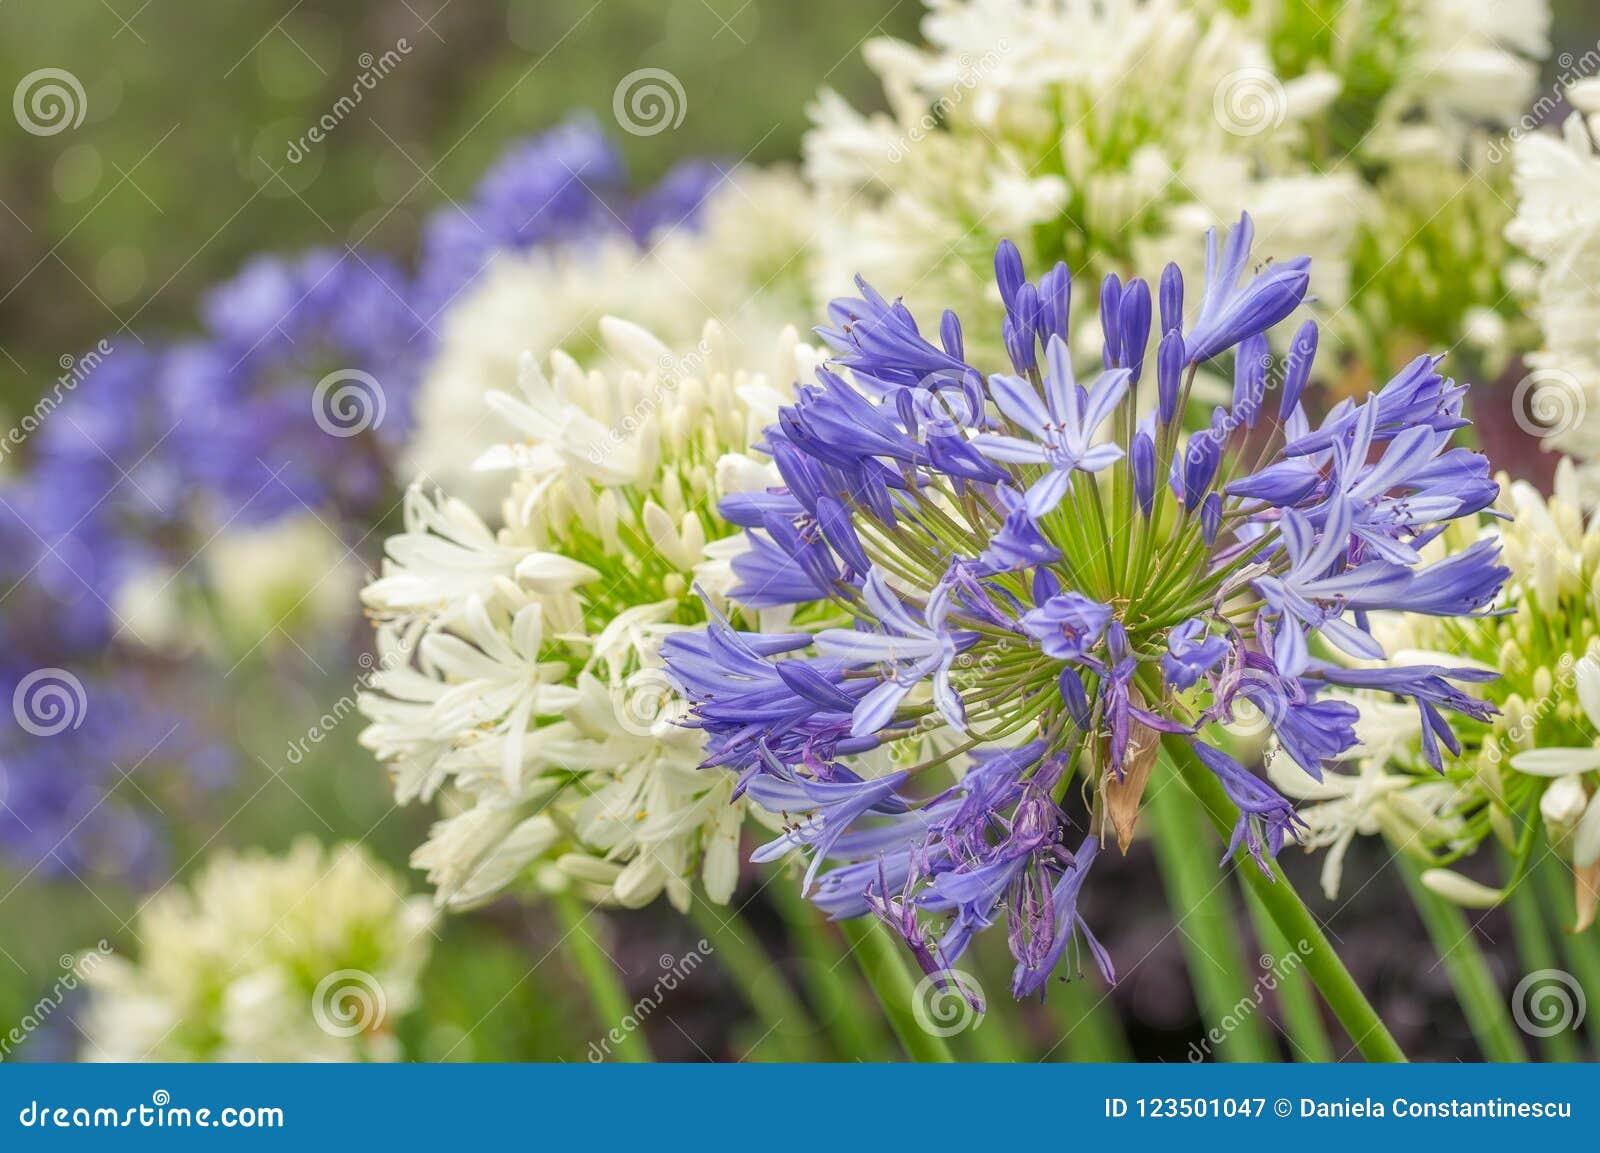 Striking Blue And White Agapanthus Flowers Stock Image Image Of